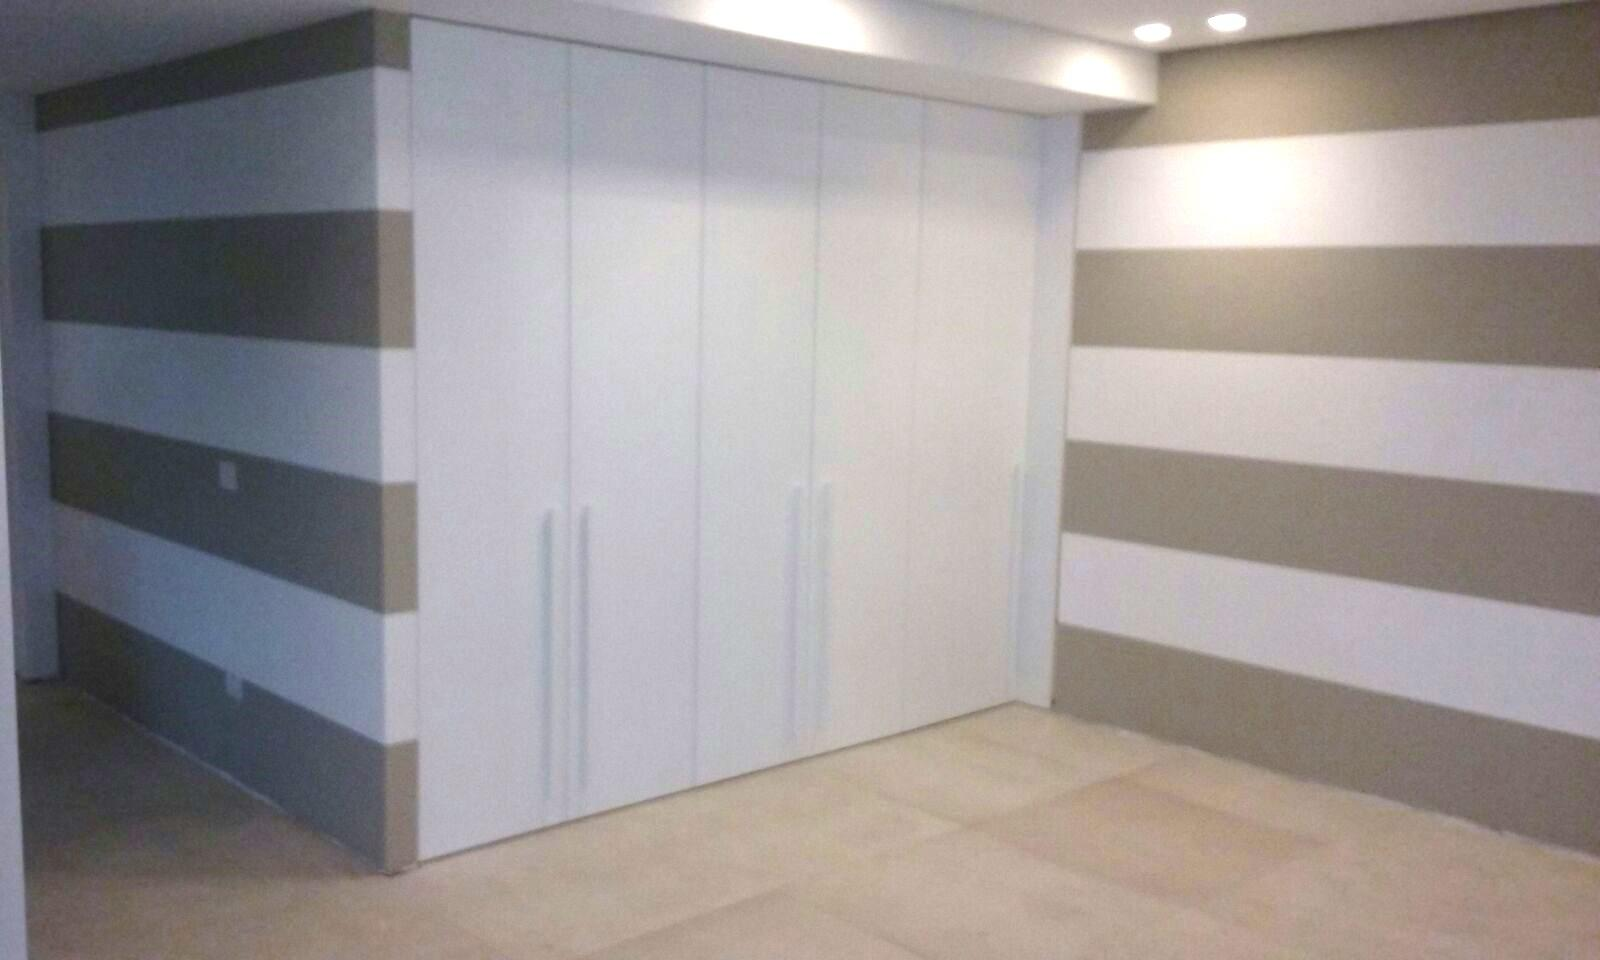 Armadio Filo Muro armadio filo muro - caltagirone (catania)